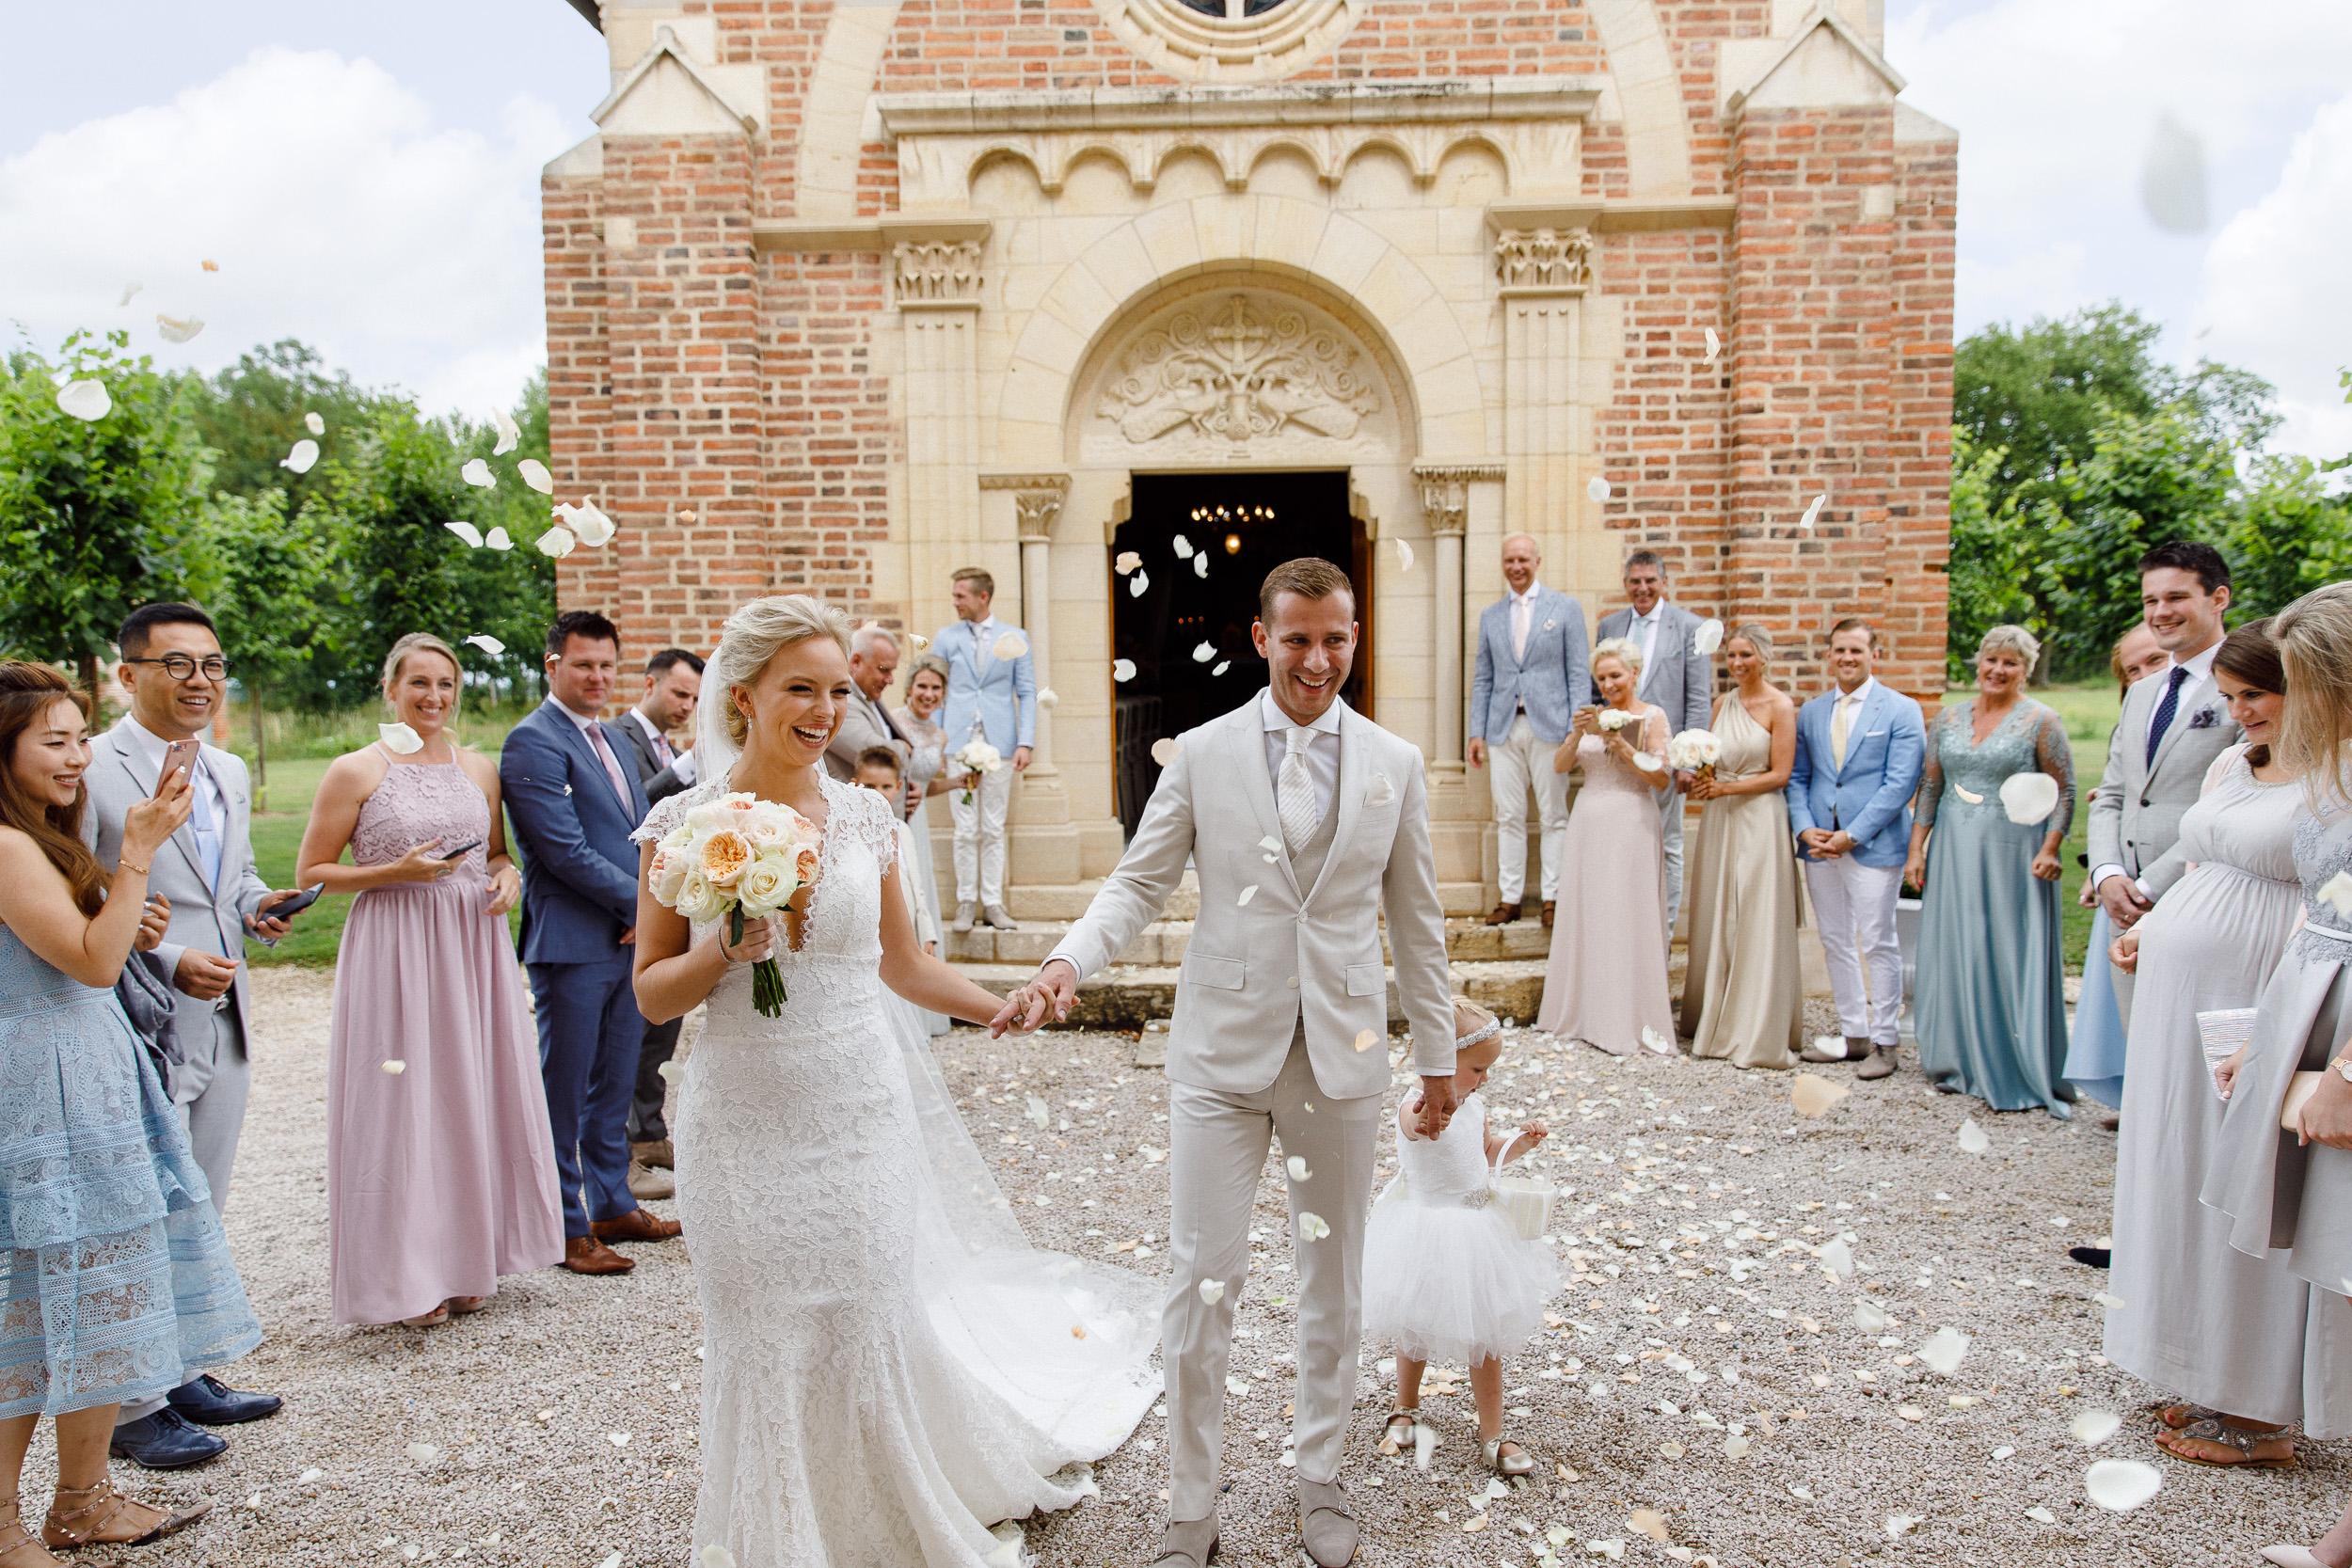 Wedding-Chateau-de-Varennes-054.jpg